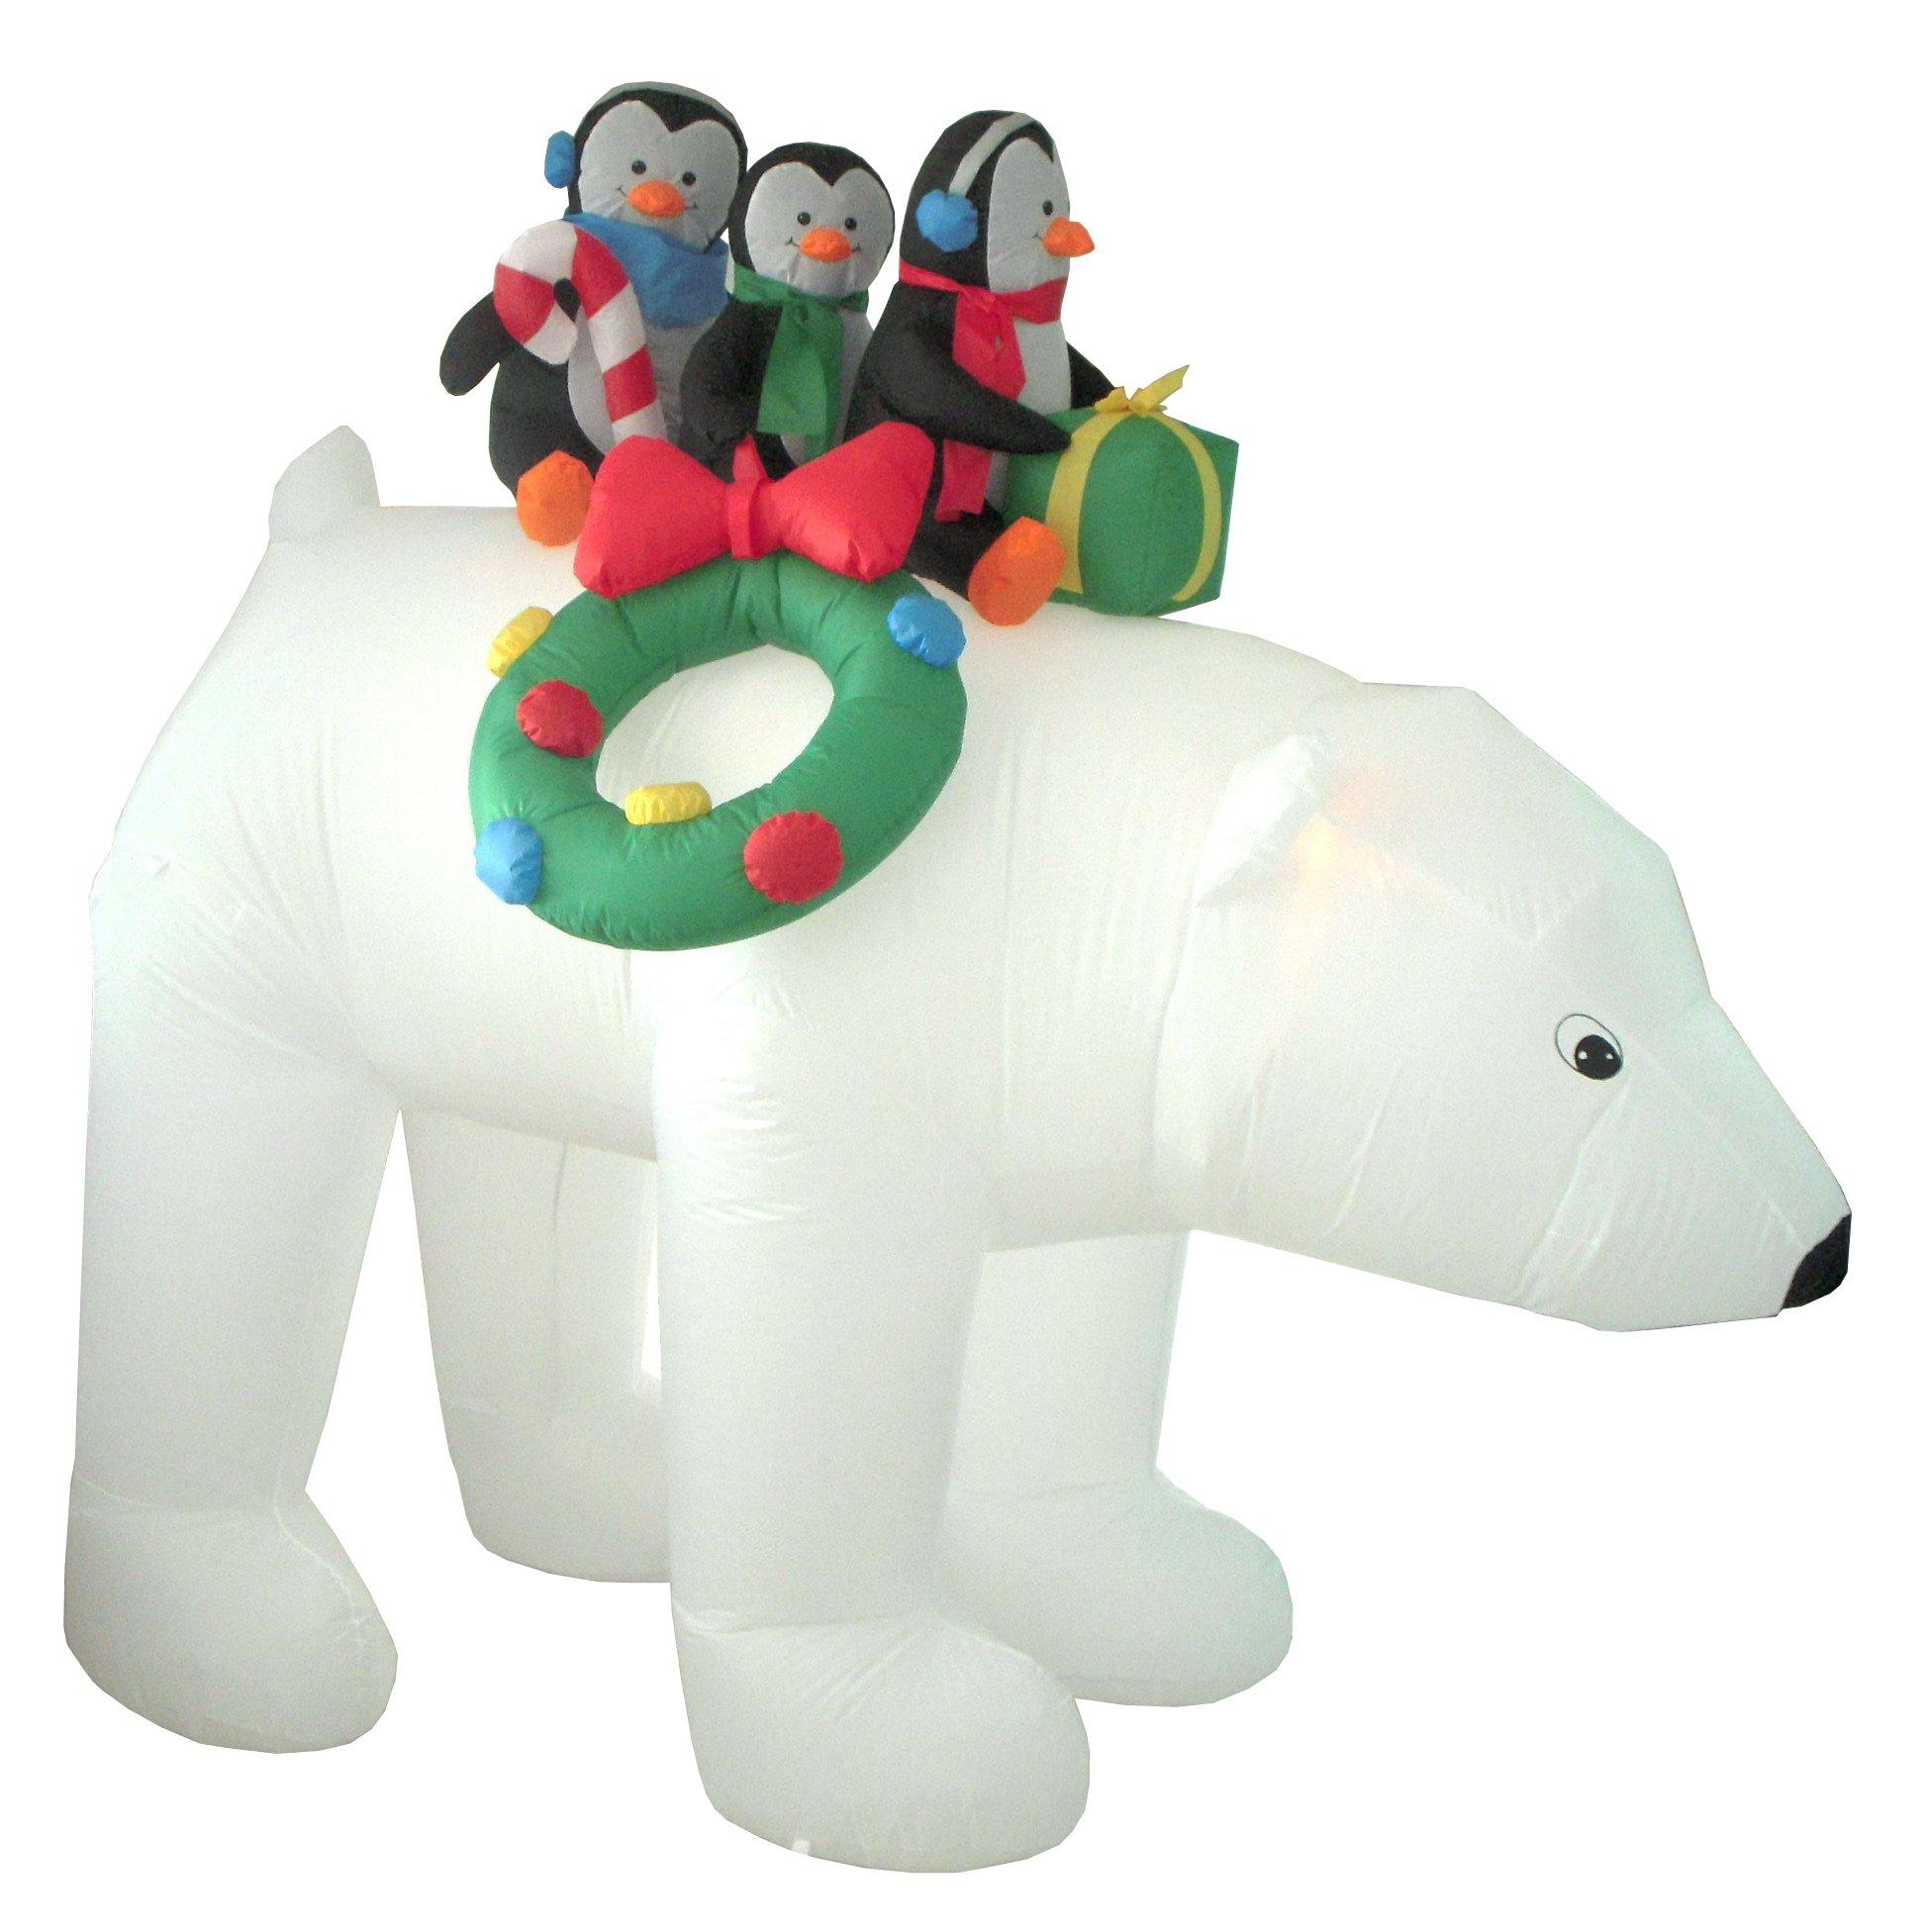 8 Foot Christmas Inflatable 3 Penguins on Polar Bear Outdoor Yard Decoration